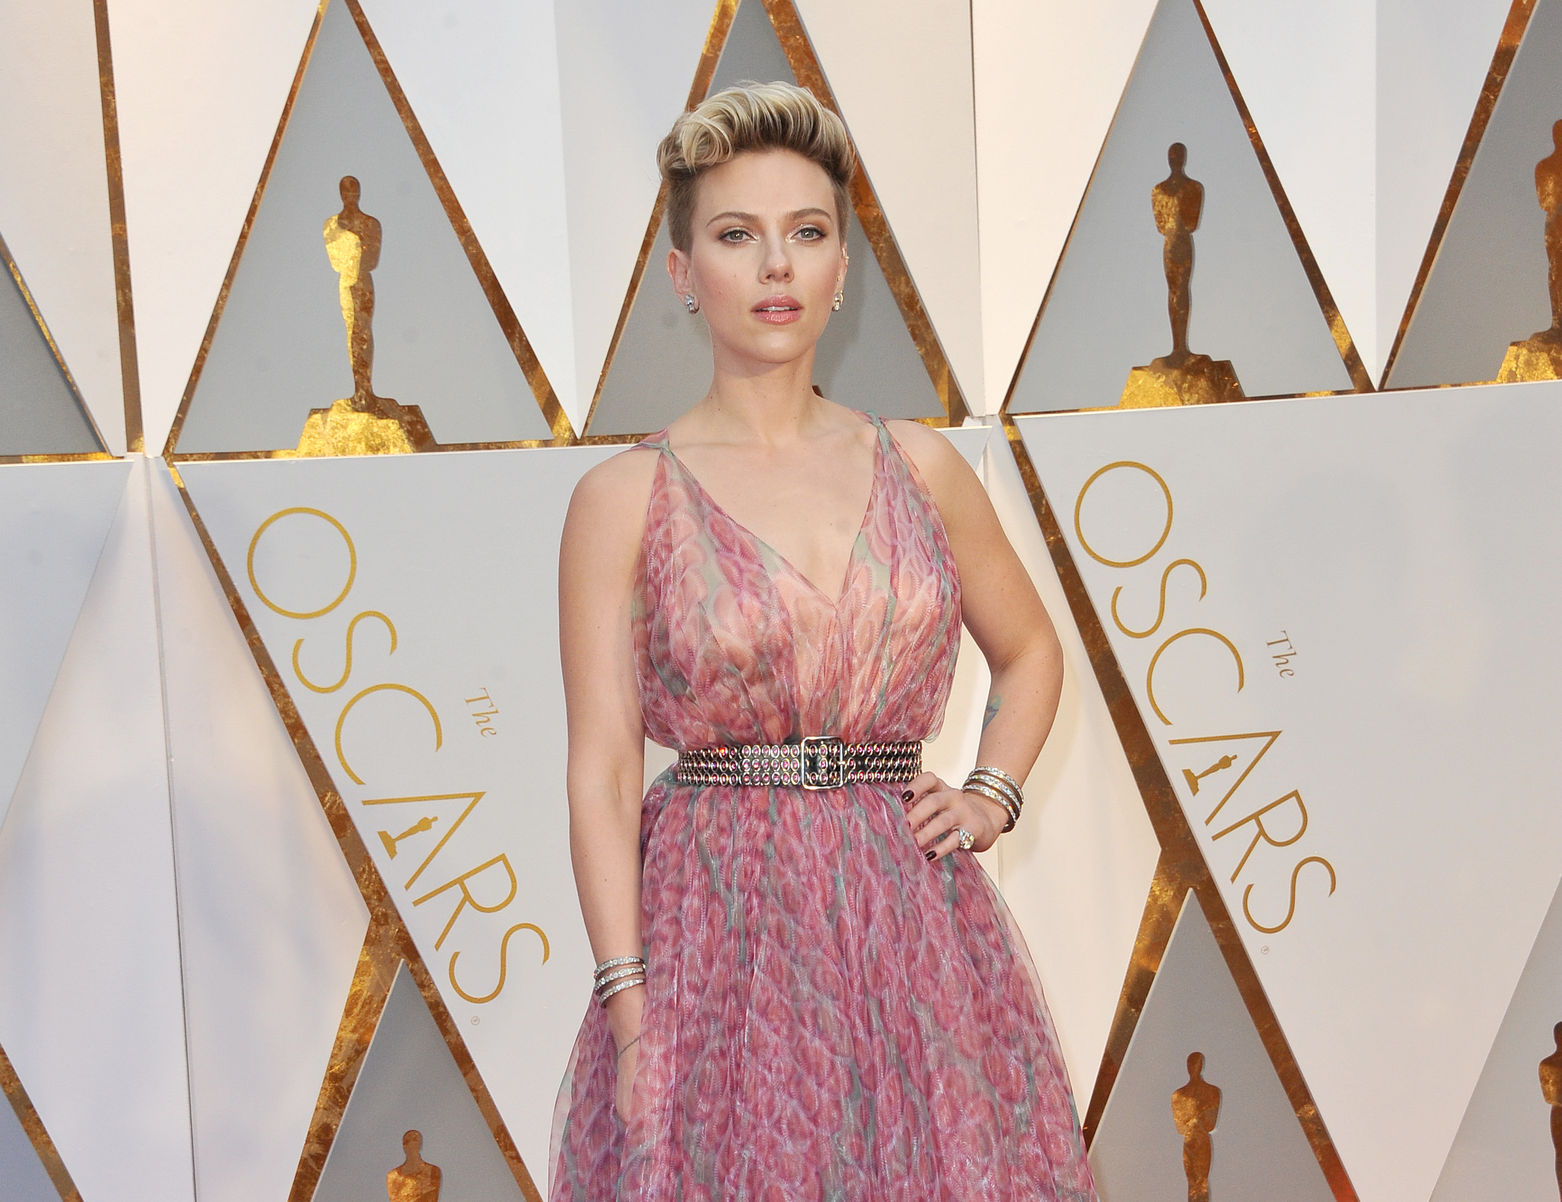 Aprende a hablar inglés como Scarlett Johansson